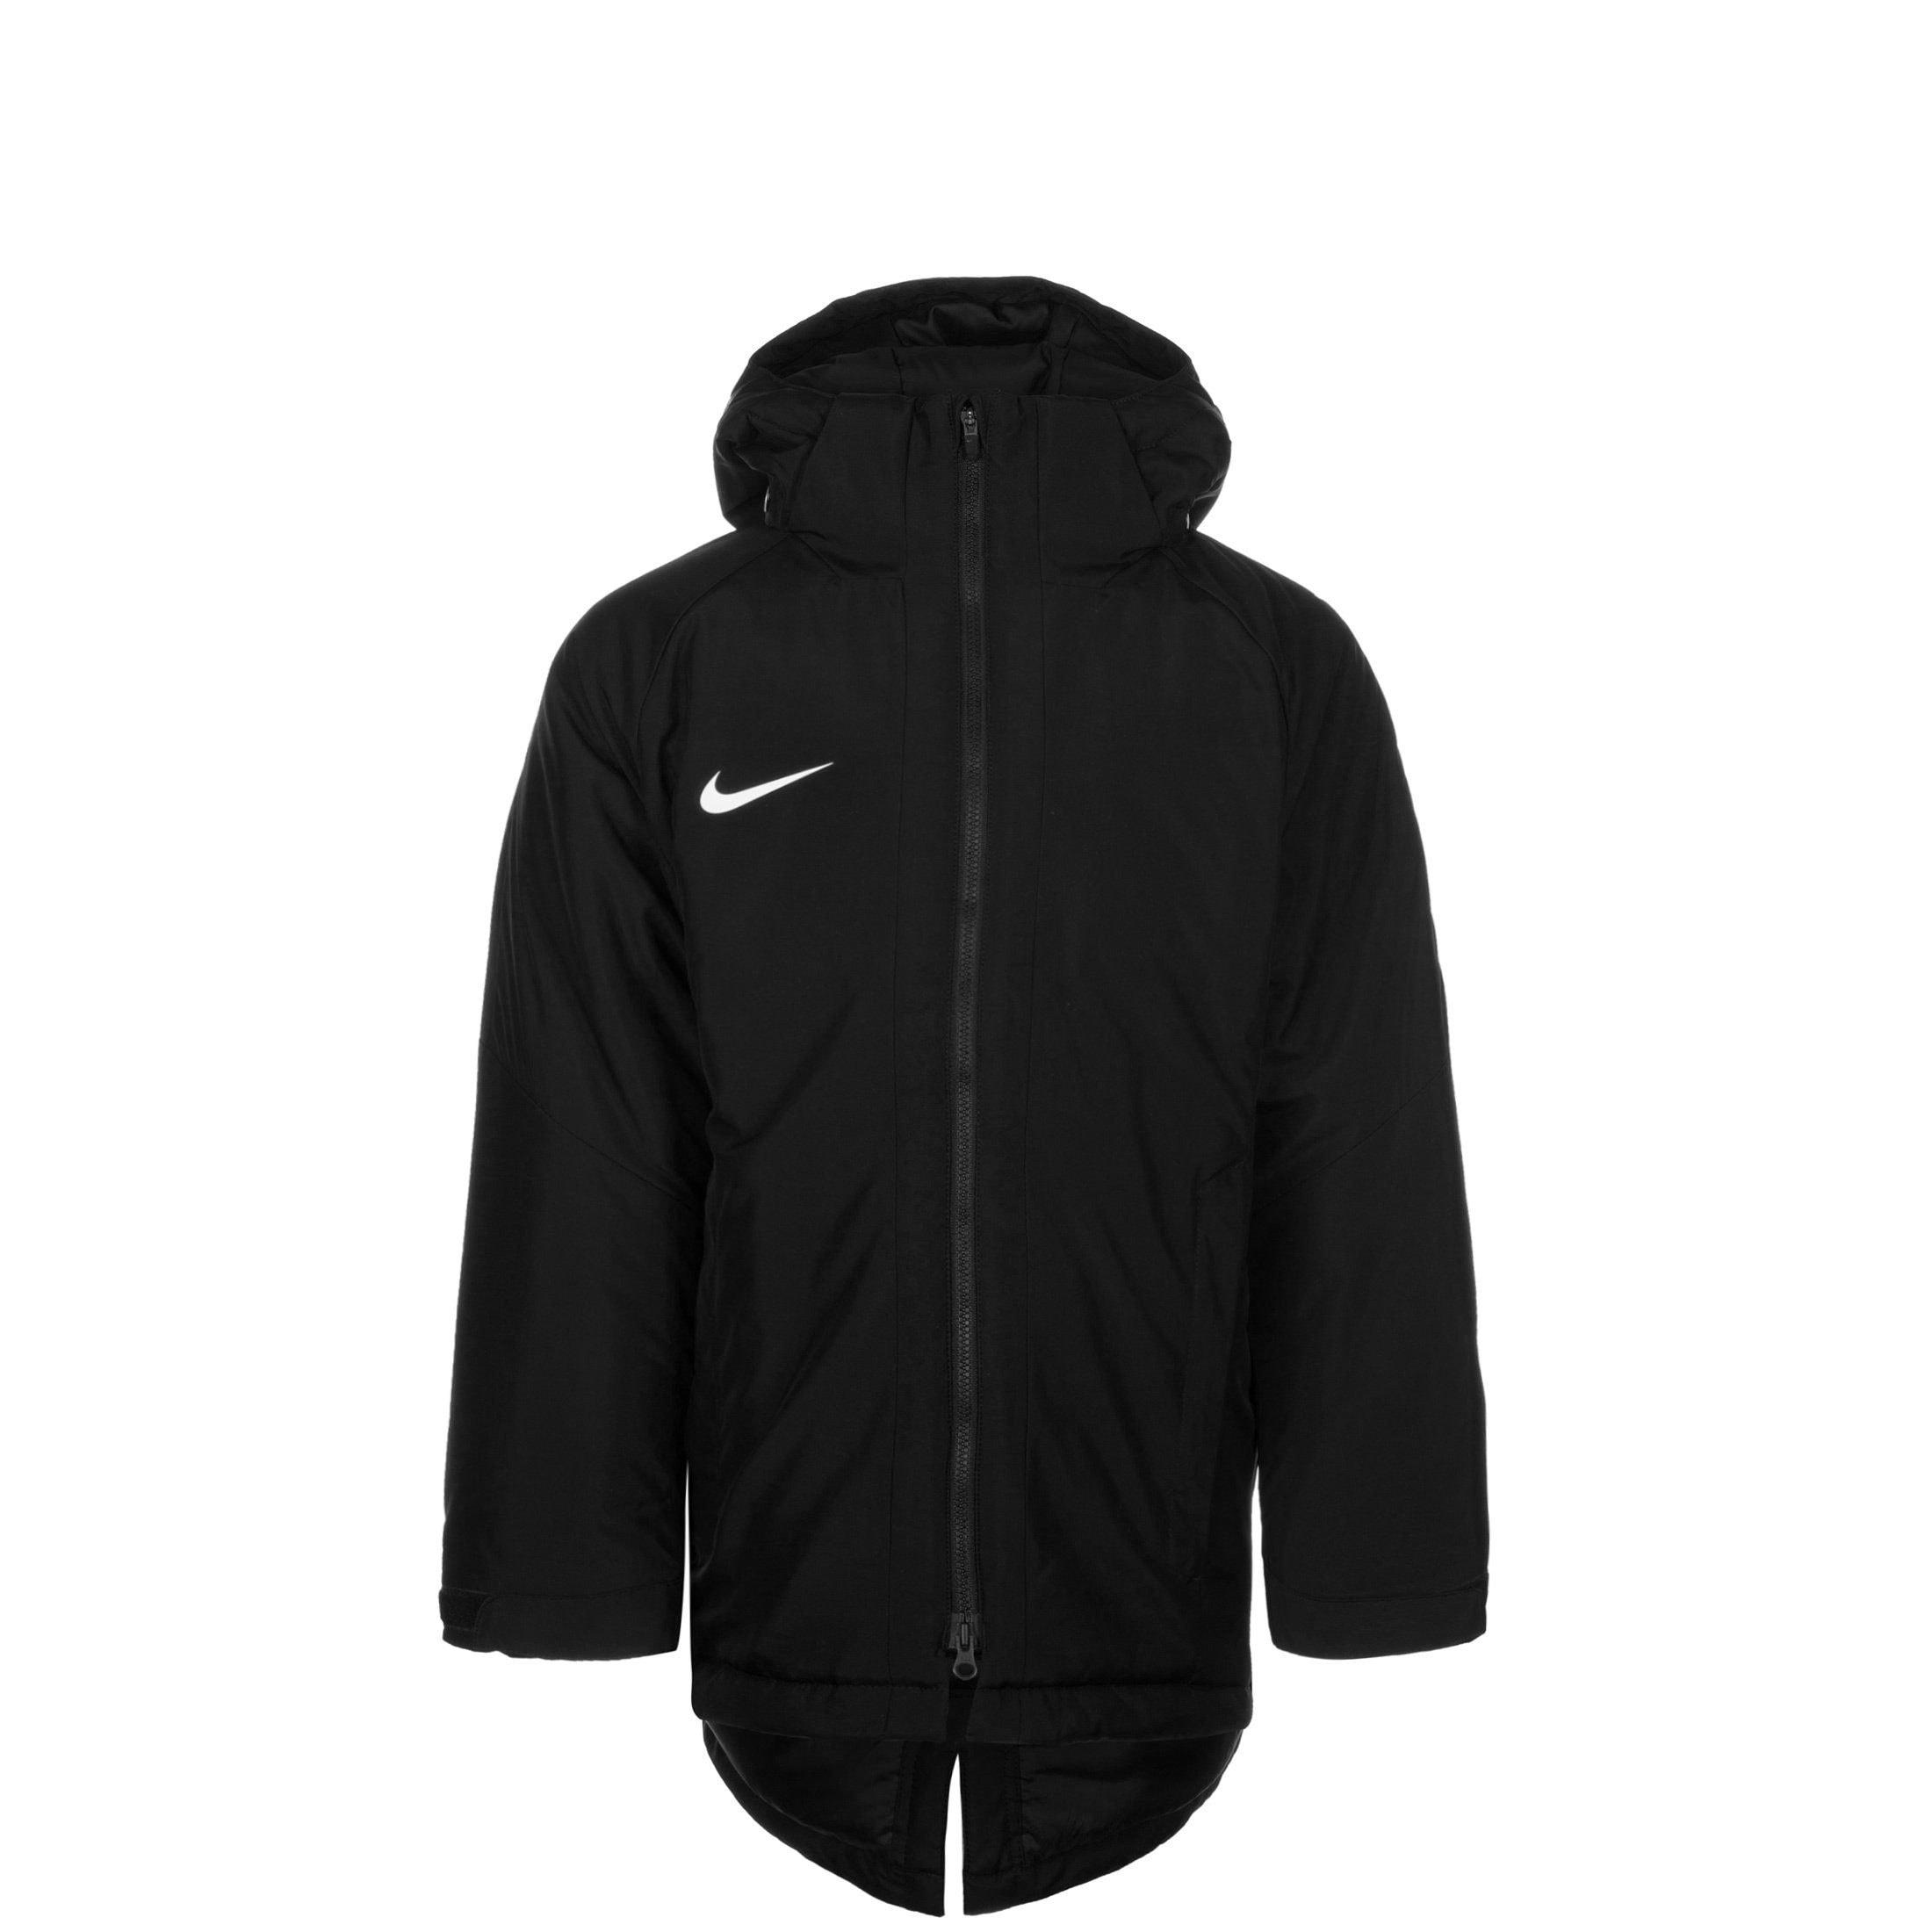 Nike Outdoorjacke »Dry Academy 18 Sdf« | BAUR